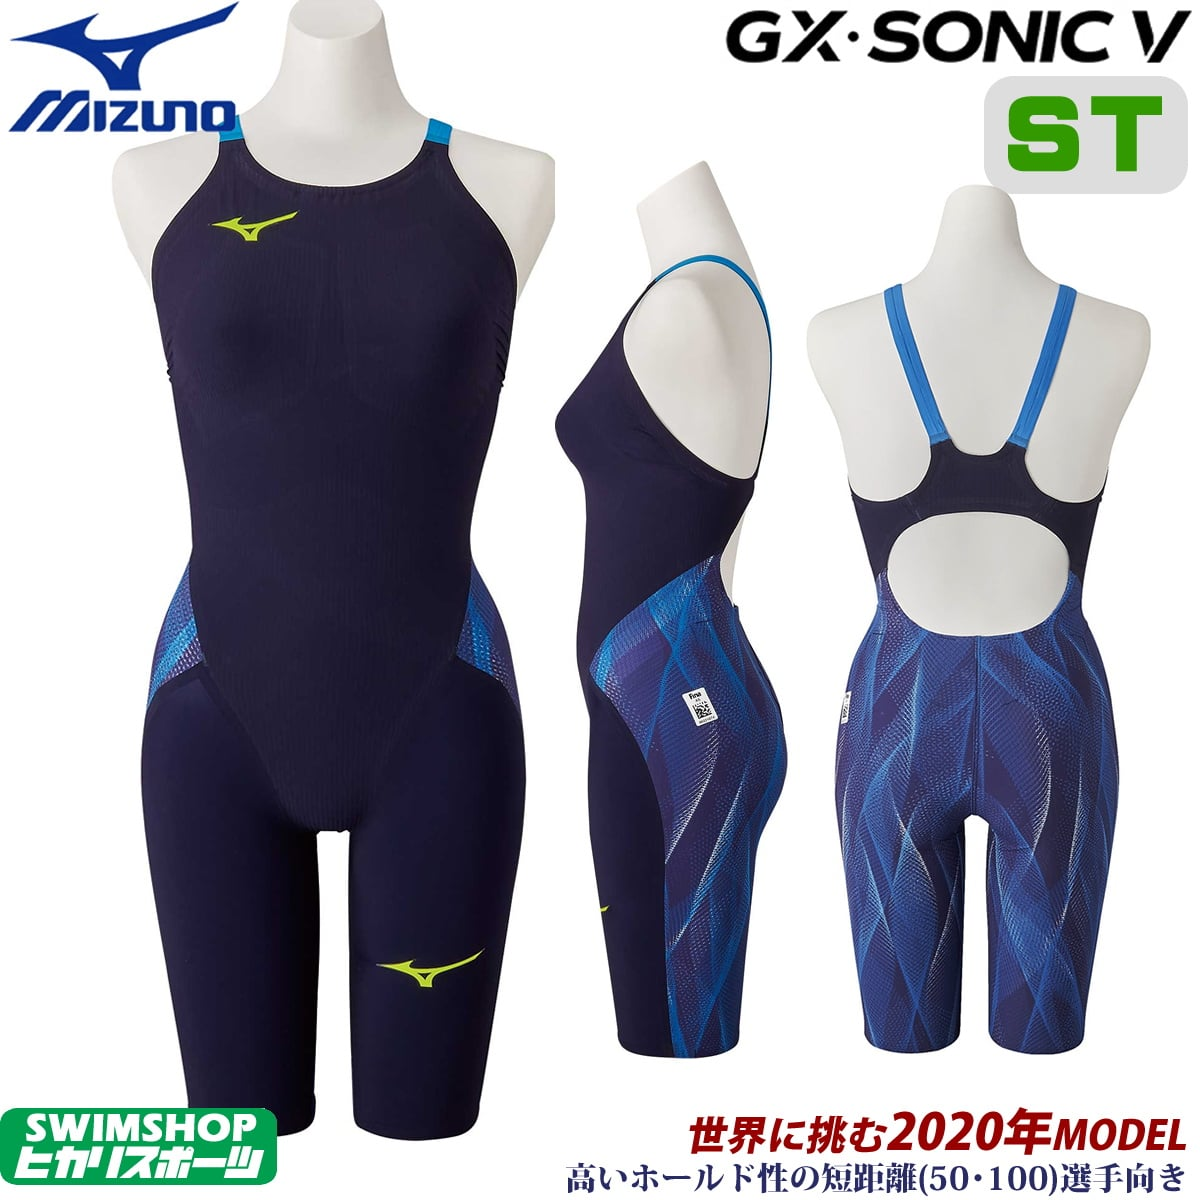 【12%OFFクーポン対象】ミズノ 競泳水着 レディース GX SONIC5 ST スプリンター オーロラ×ブルー Fina承認 ハーフスーツ 布帛素材 短距離 選手向き MIZUNO 高速水着 2020年モデル 女性用 N2MG0201